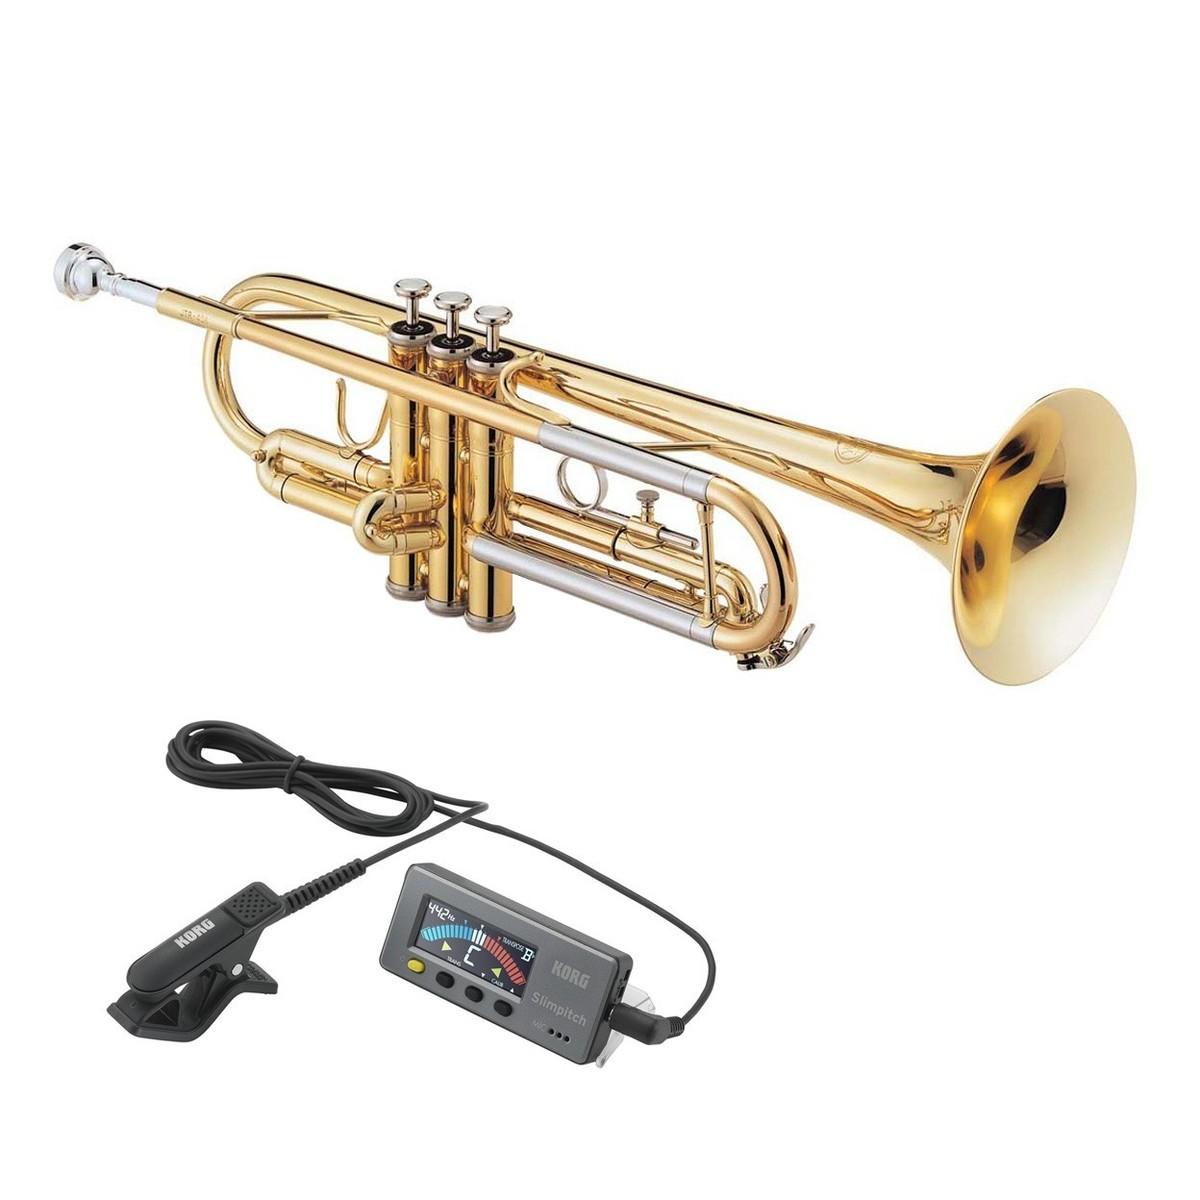 Image of Jupiter JTR-1102RL Trumpet with Free Slimpitch Tuner